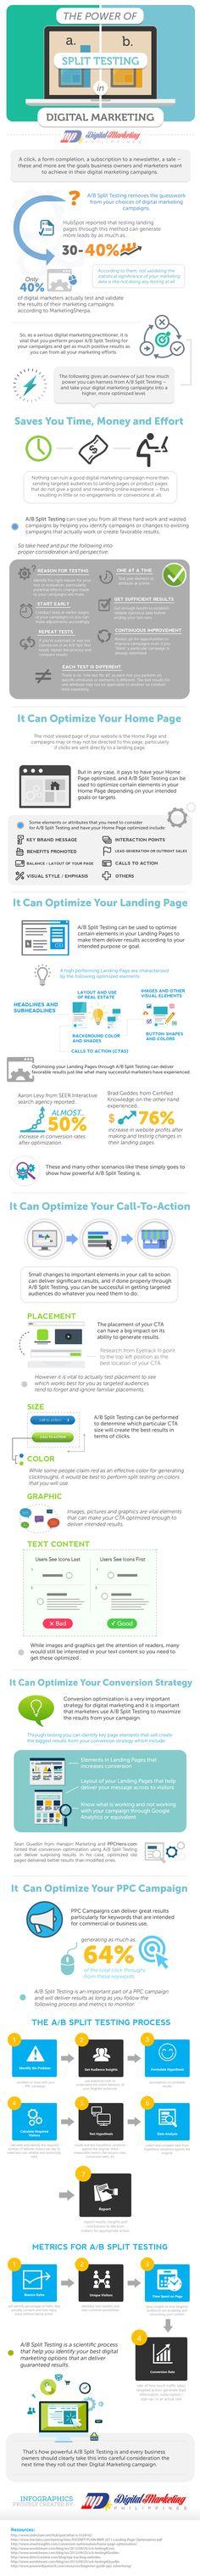 #Marketing #Infographic: The Power of Split Testing in Digital Marketing